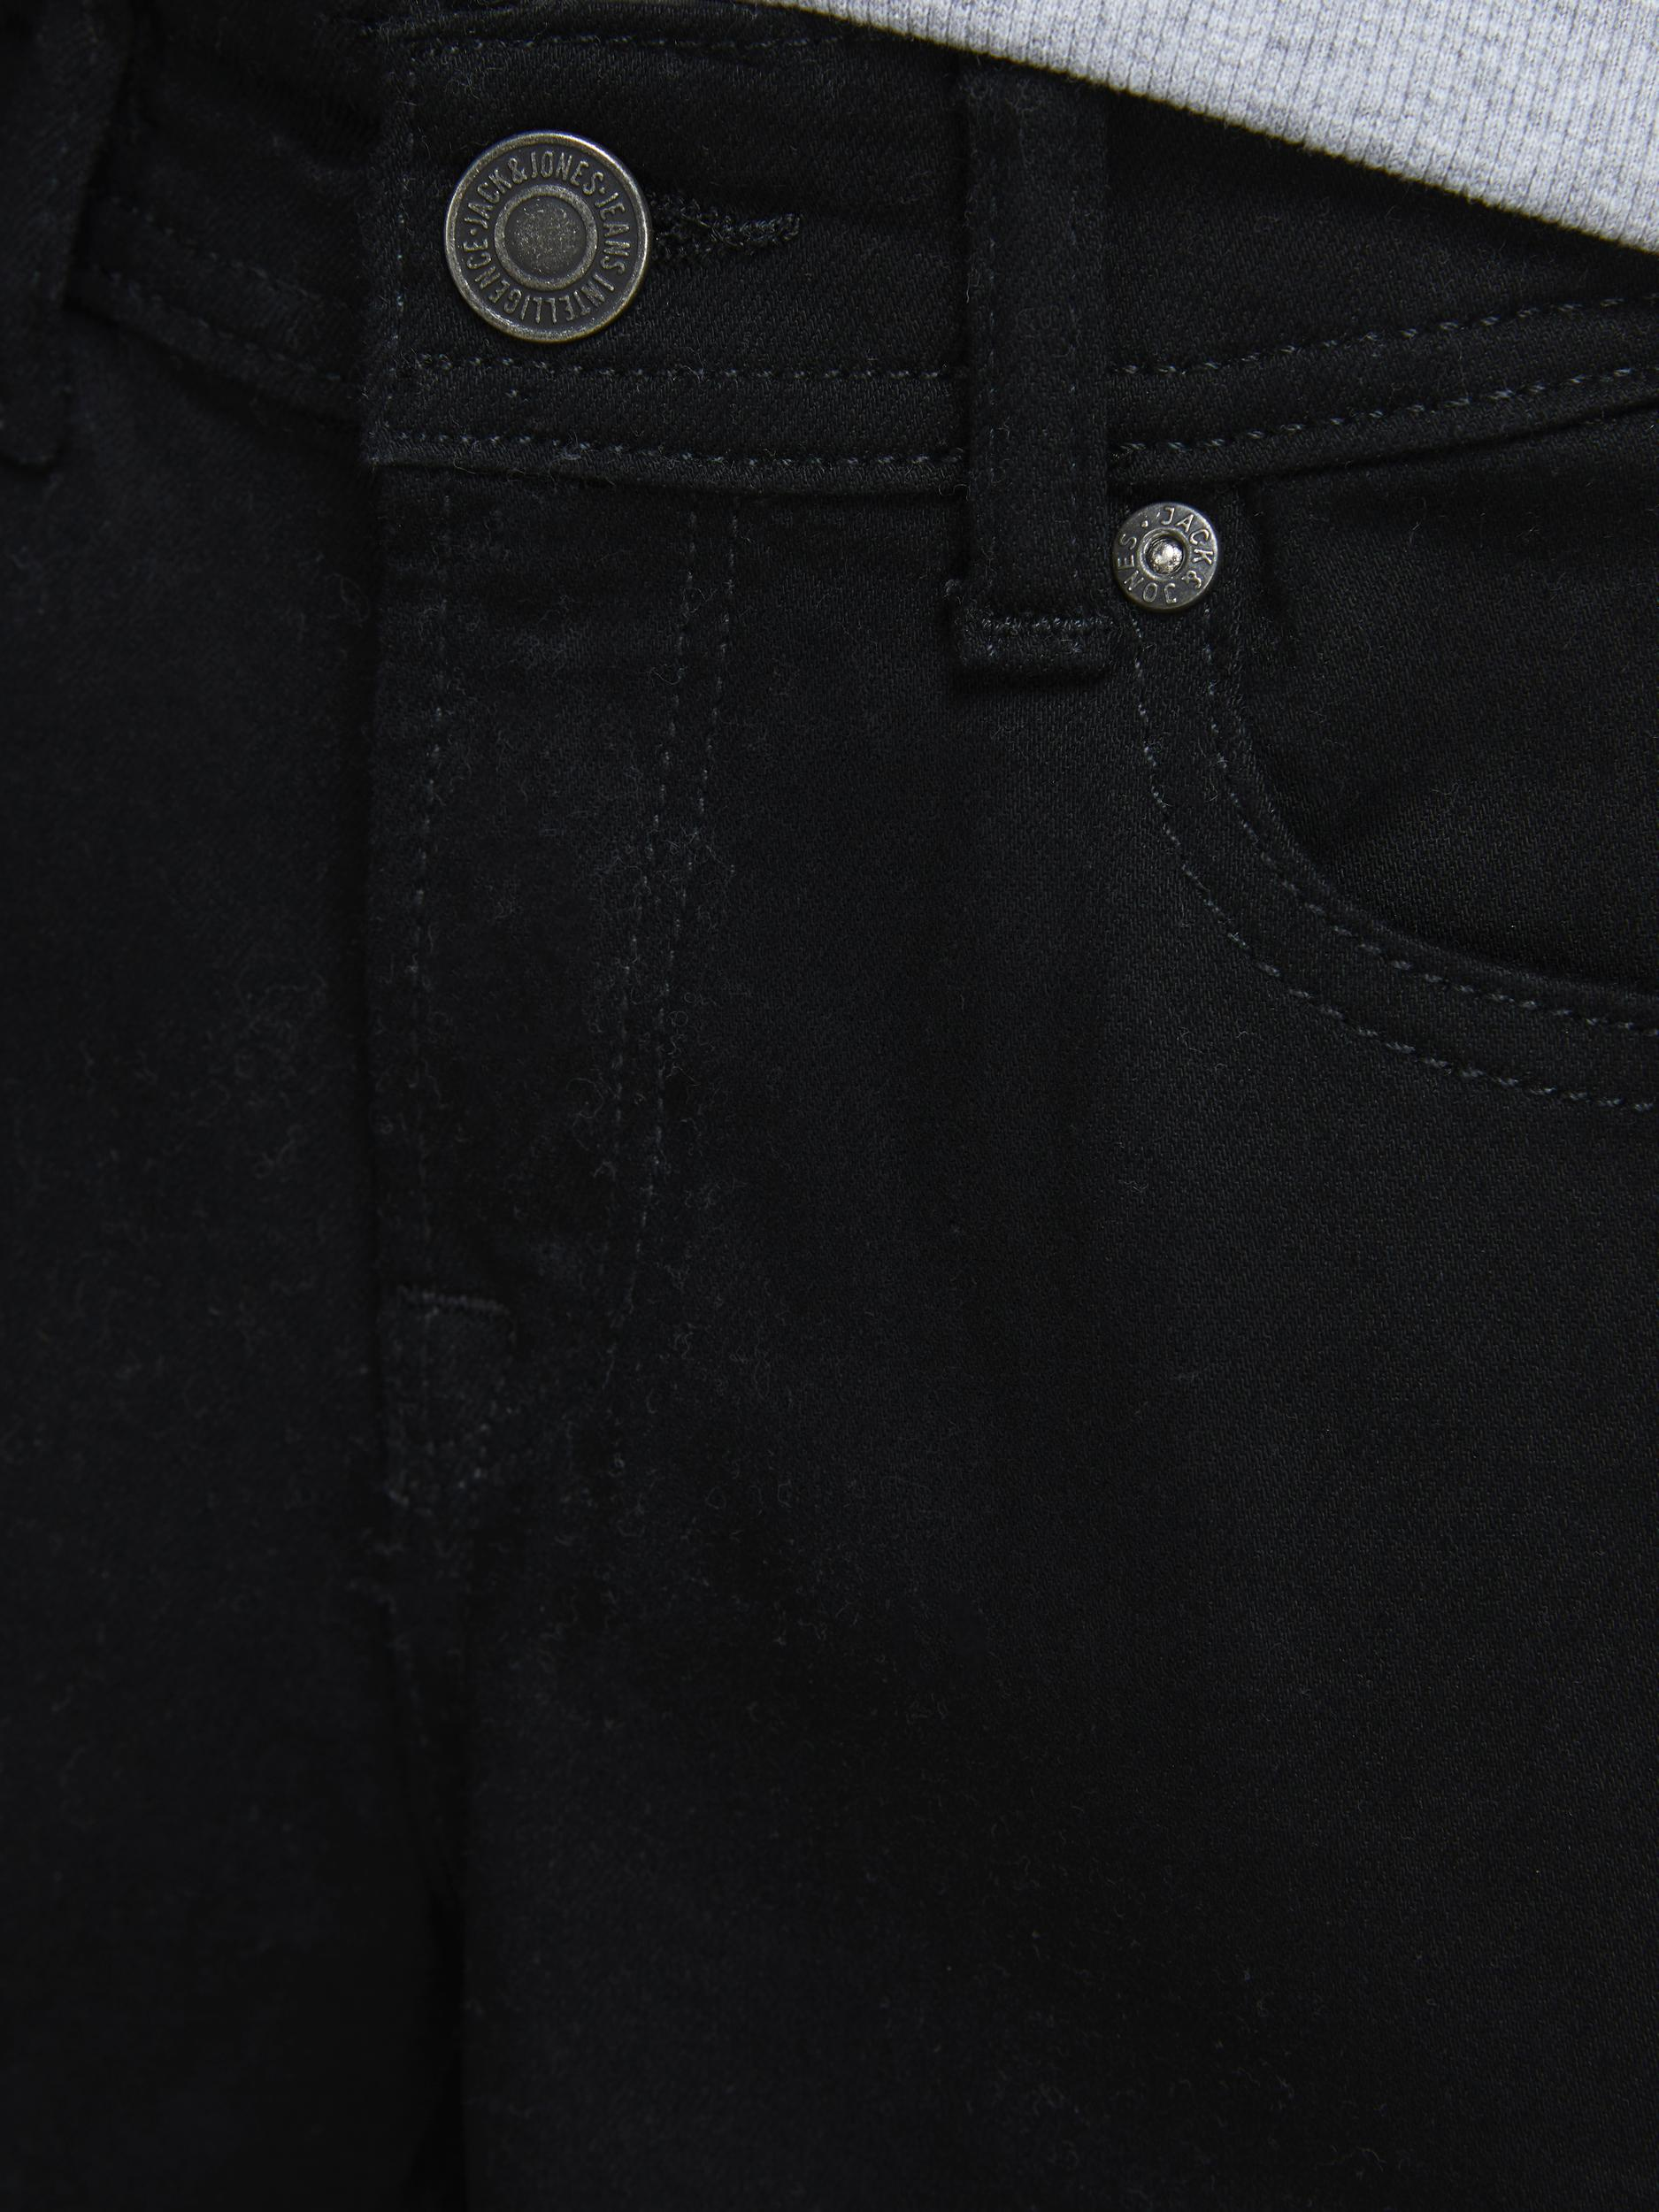 Jack & Jones Liam 829 jeans, black denim, 134